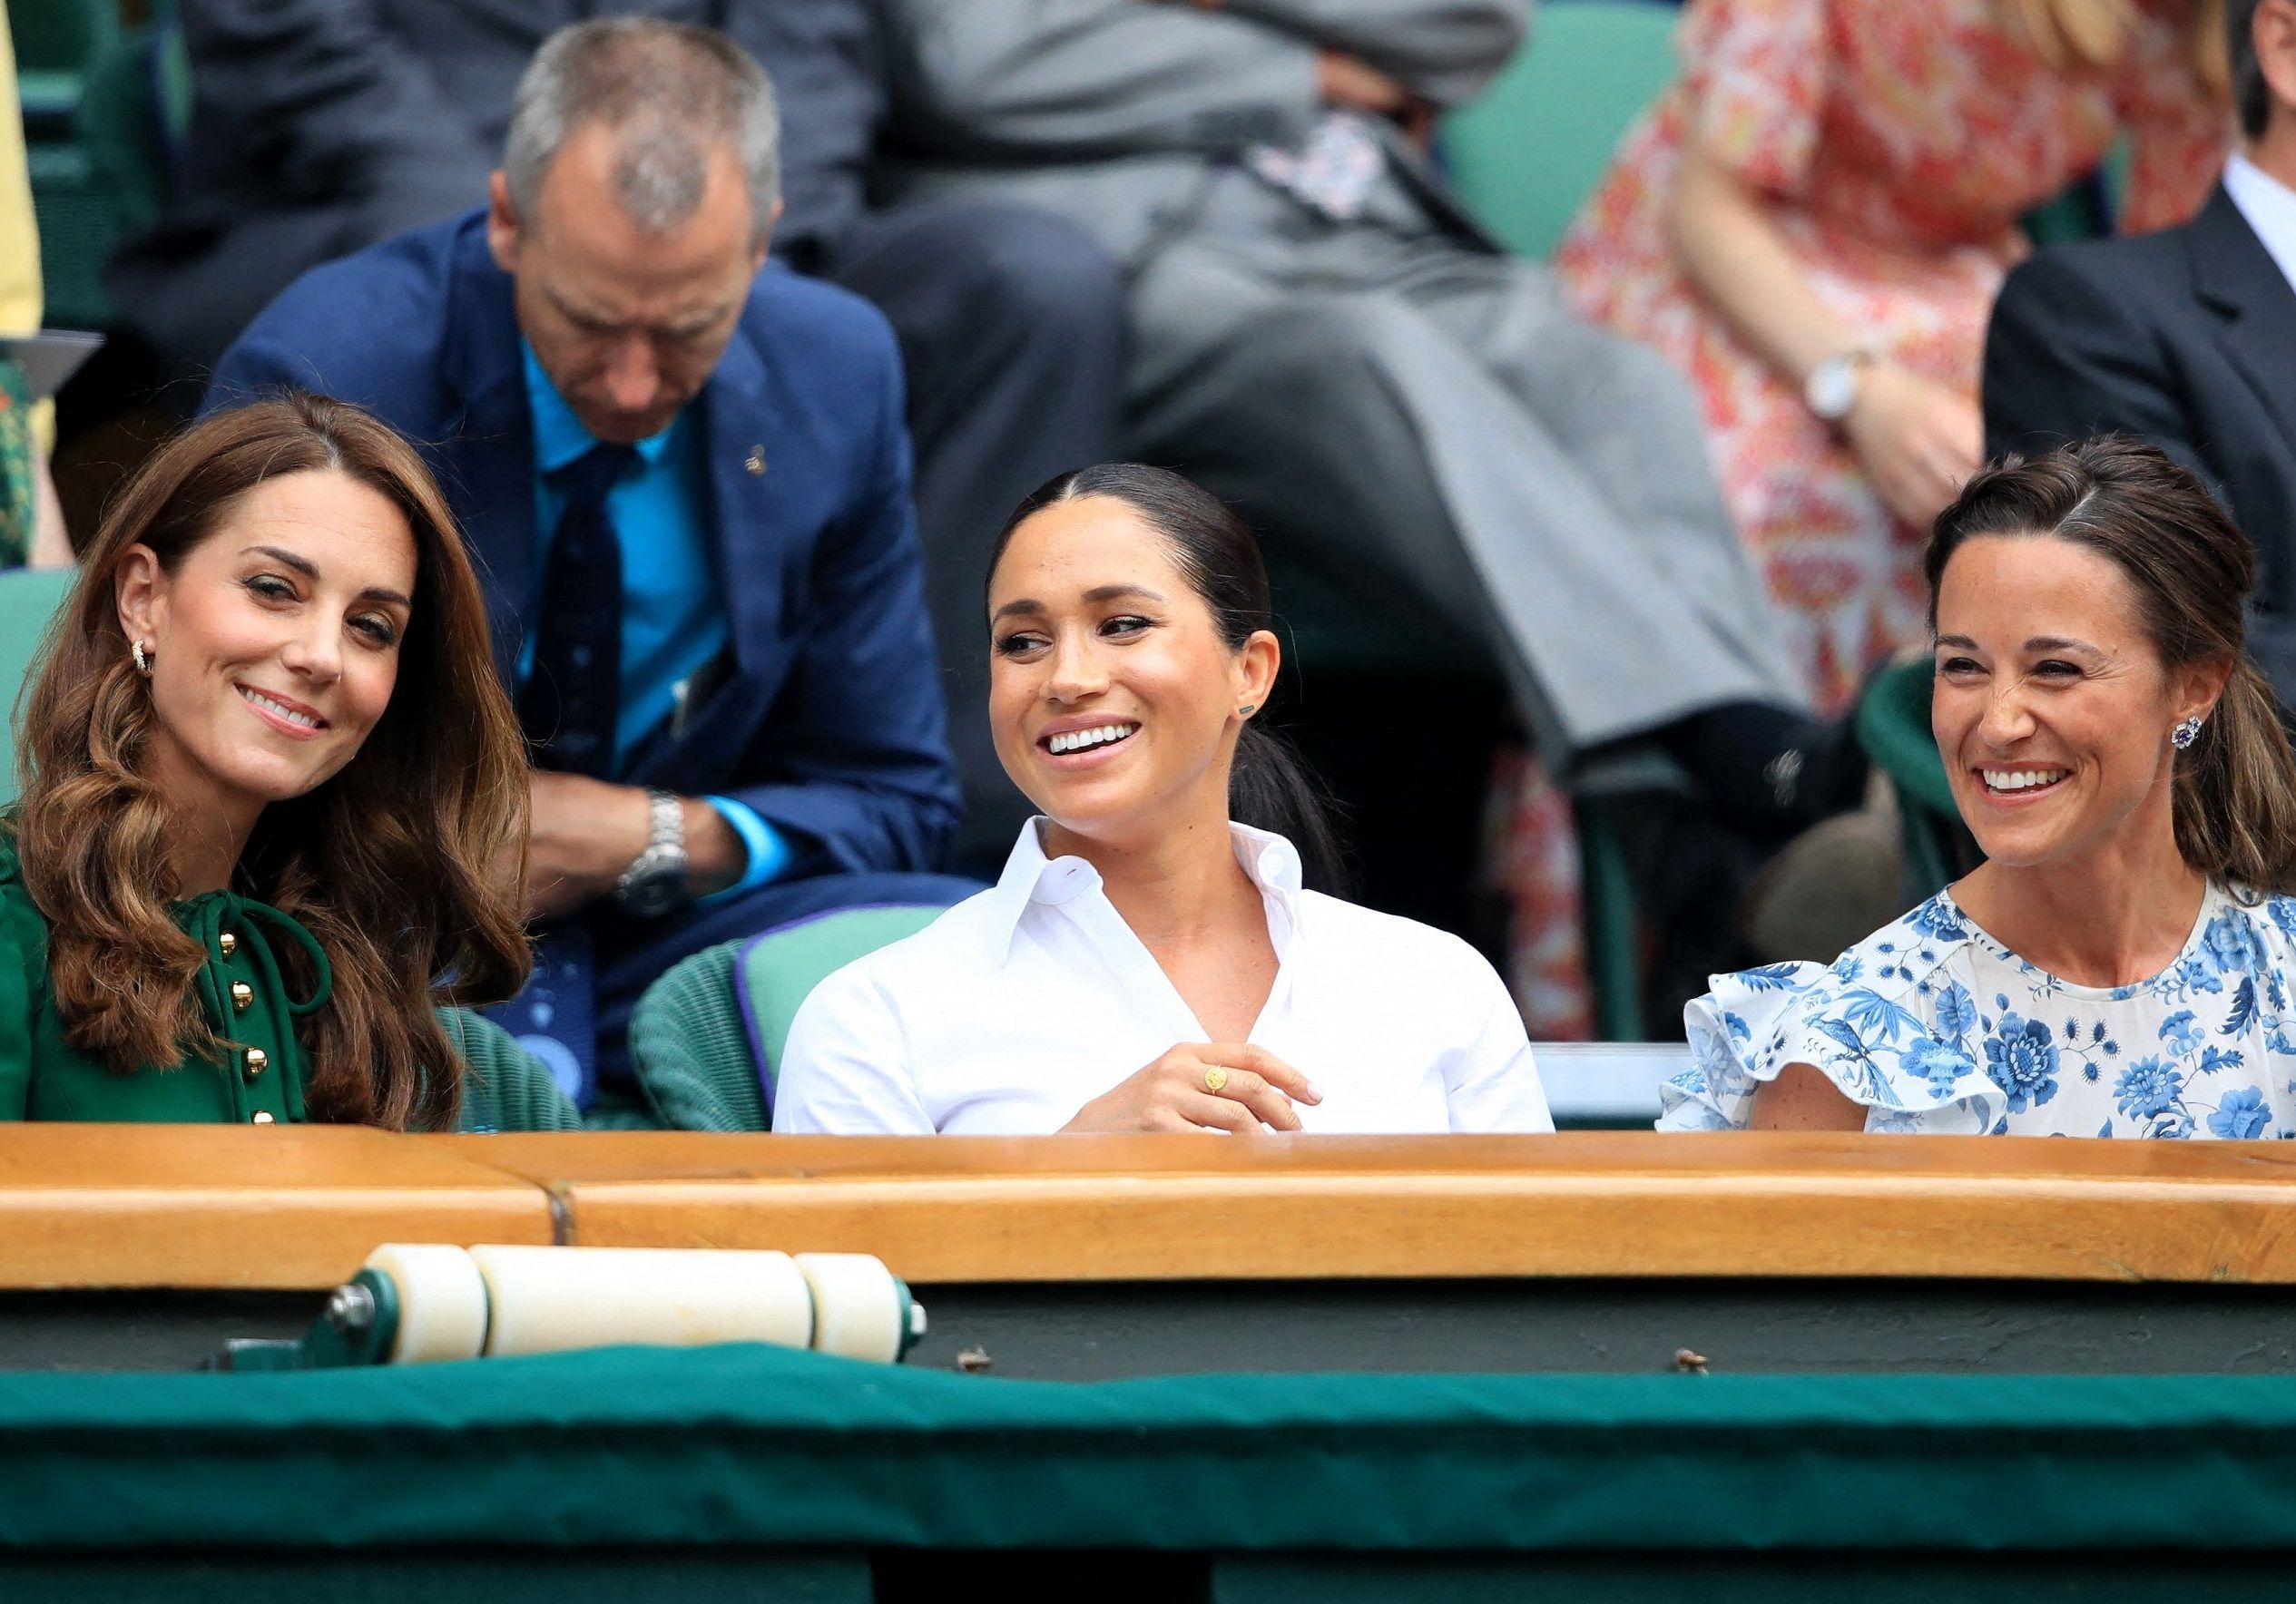 Meghan Markle, Kate Middleton et Pippa Middleton : complices pour applaudir Serena Williams à Wimbledon